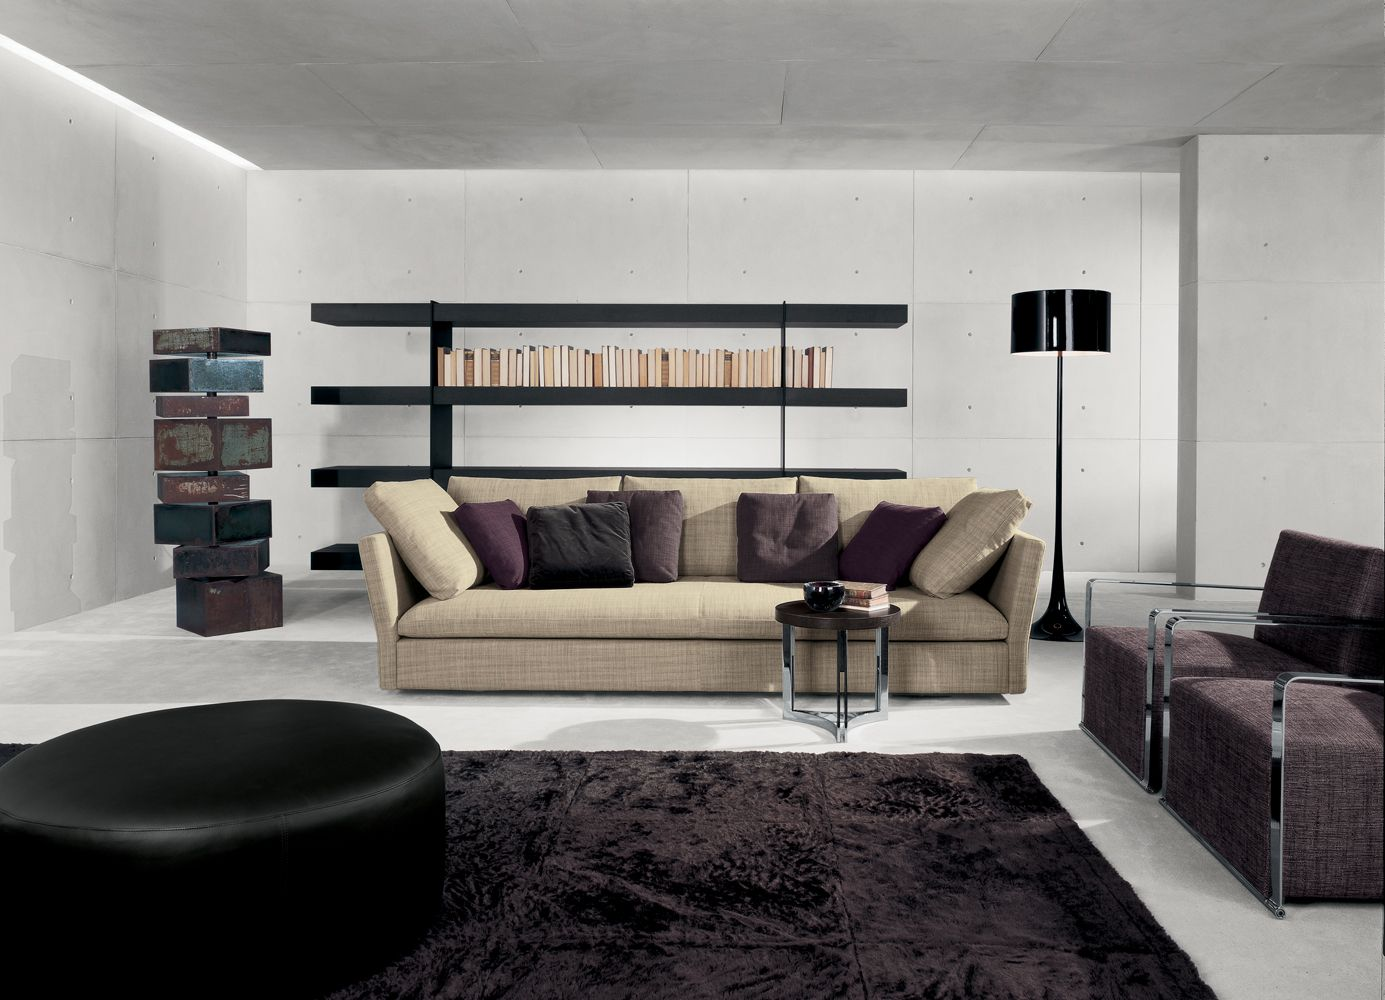 Casades s furniture design barcelona kristy collection - Sofas diseno barcelona ...